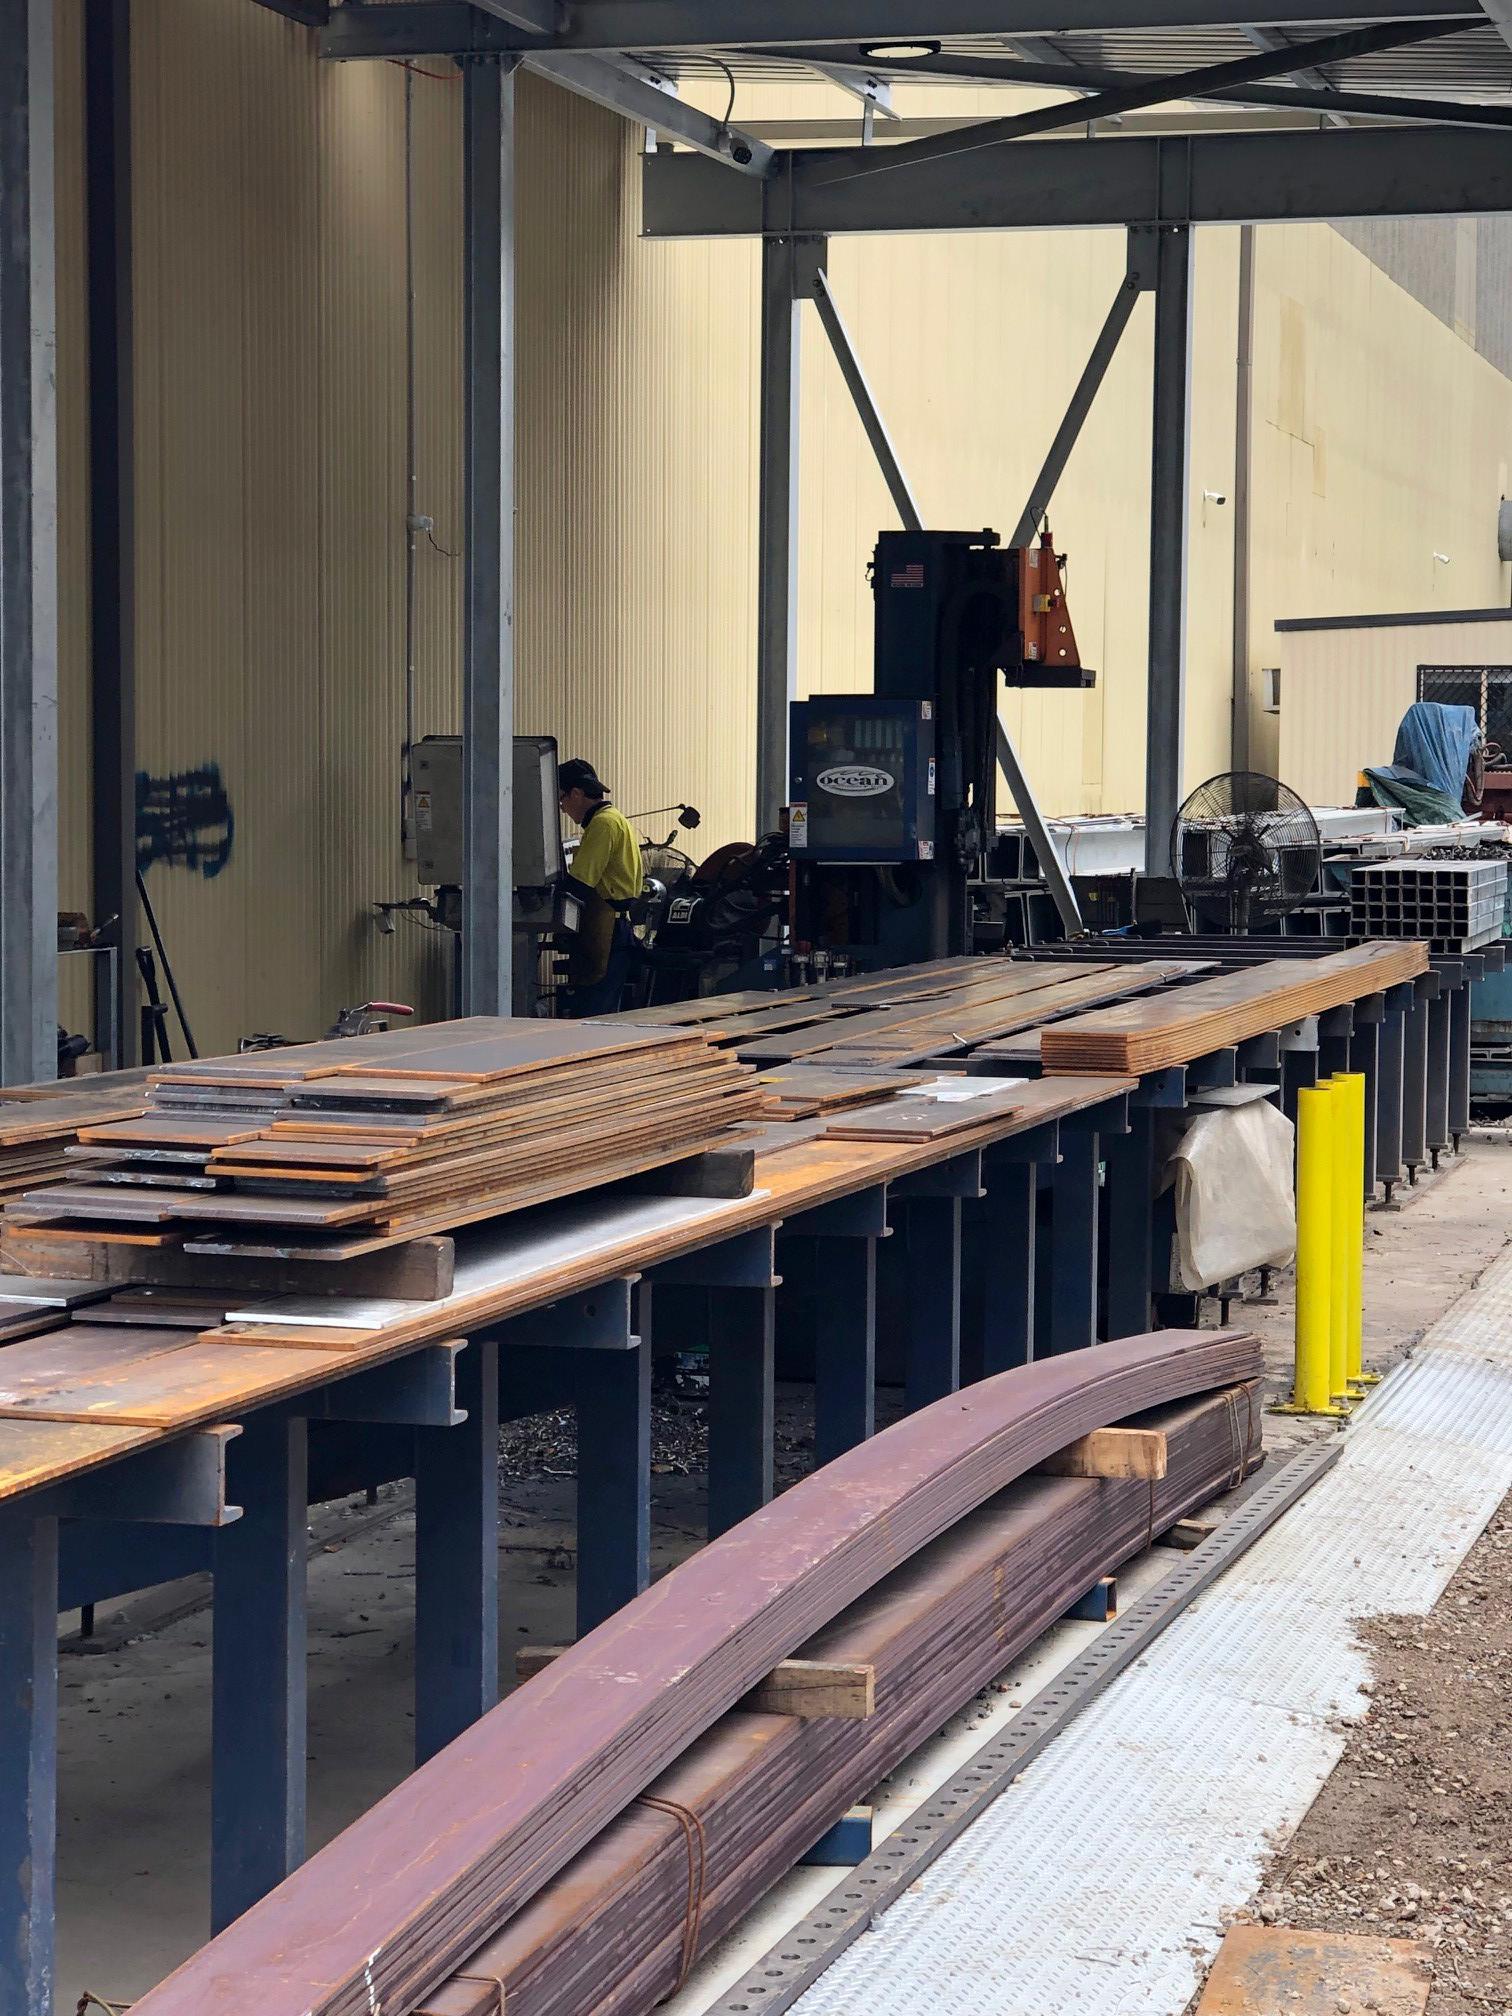 Steel Builders is now producing 80 tons of light steel per day